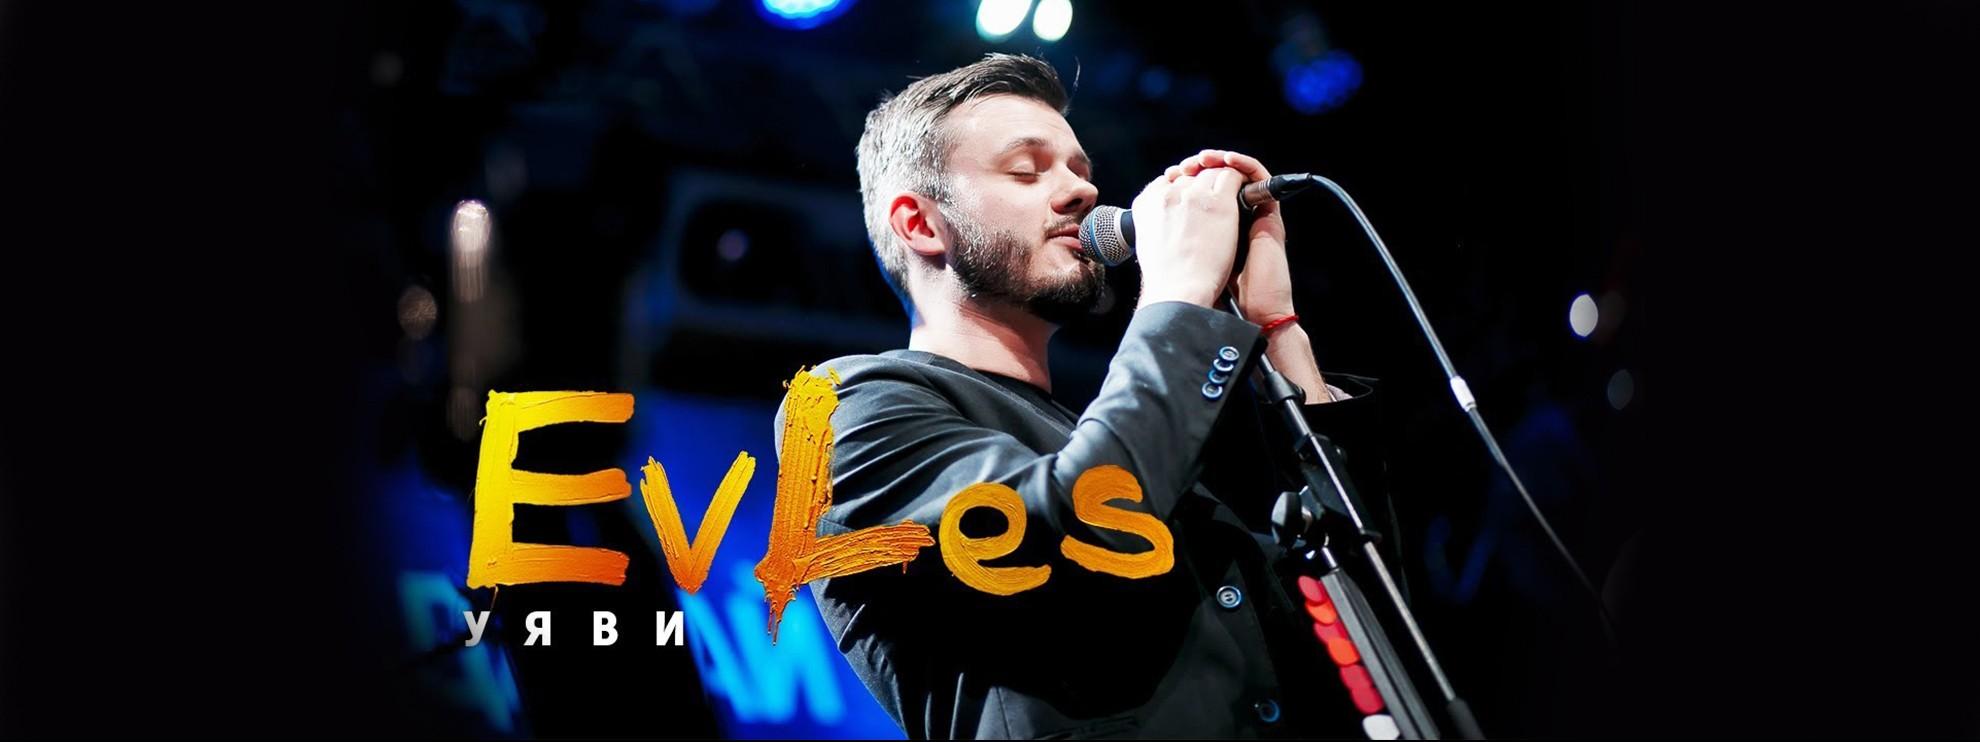 performer EvLes (Евгений Леськив)